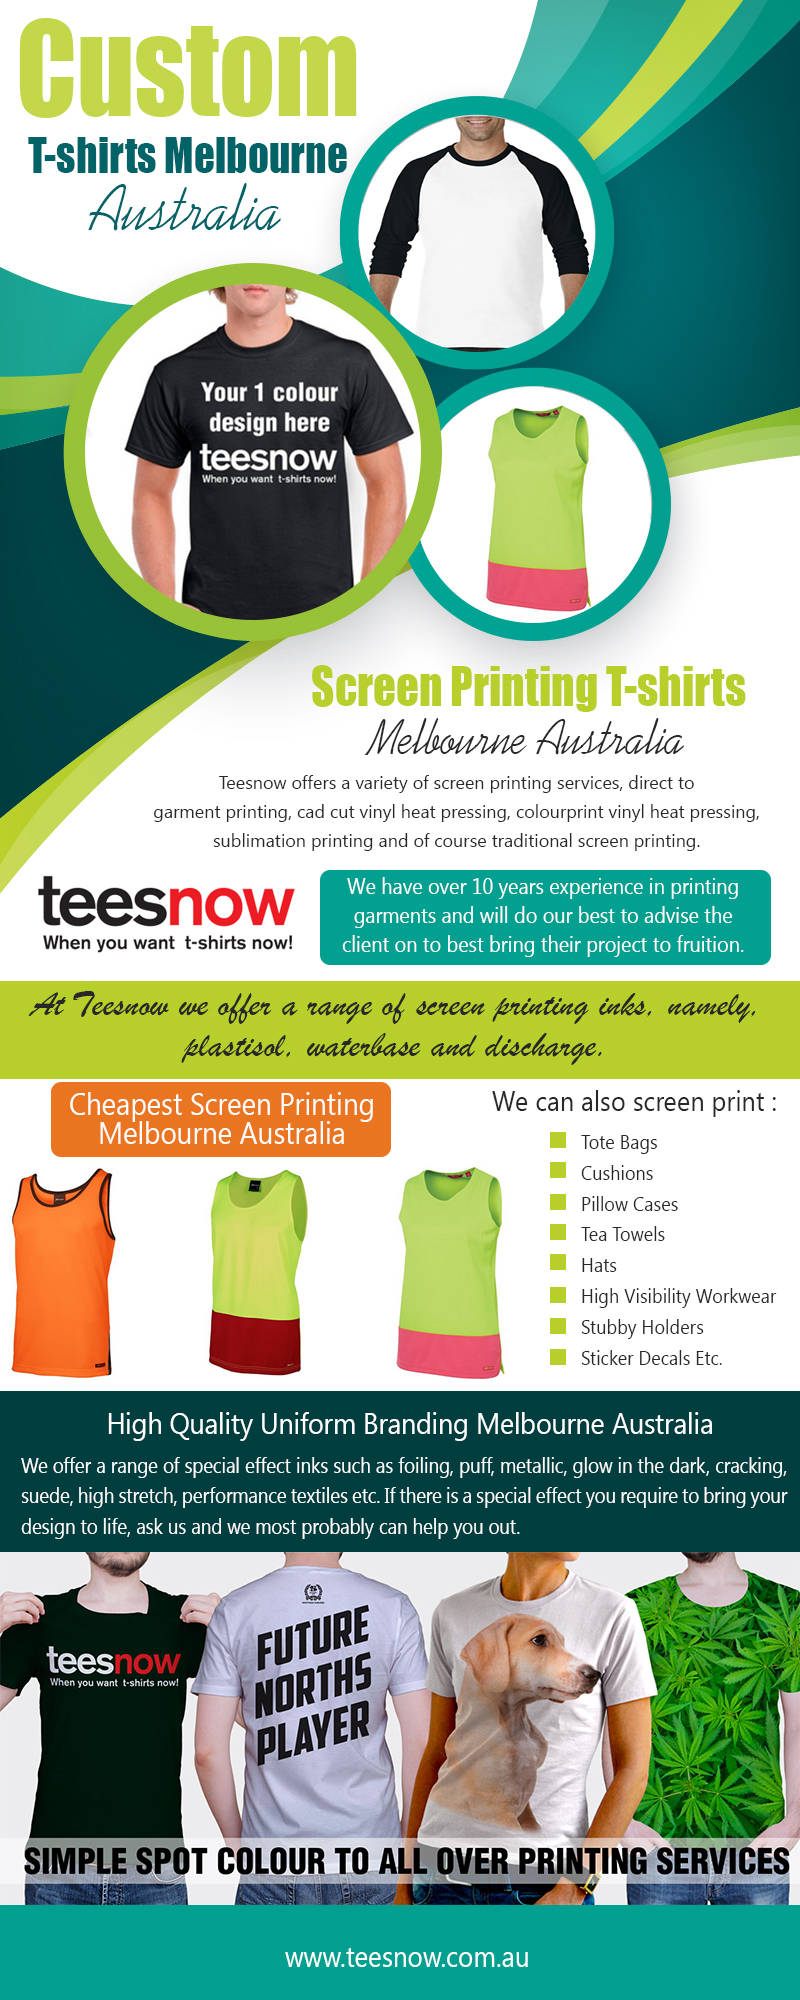 Custom T-Shirts Melbourne|https://www.teesnow.com.au/